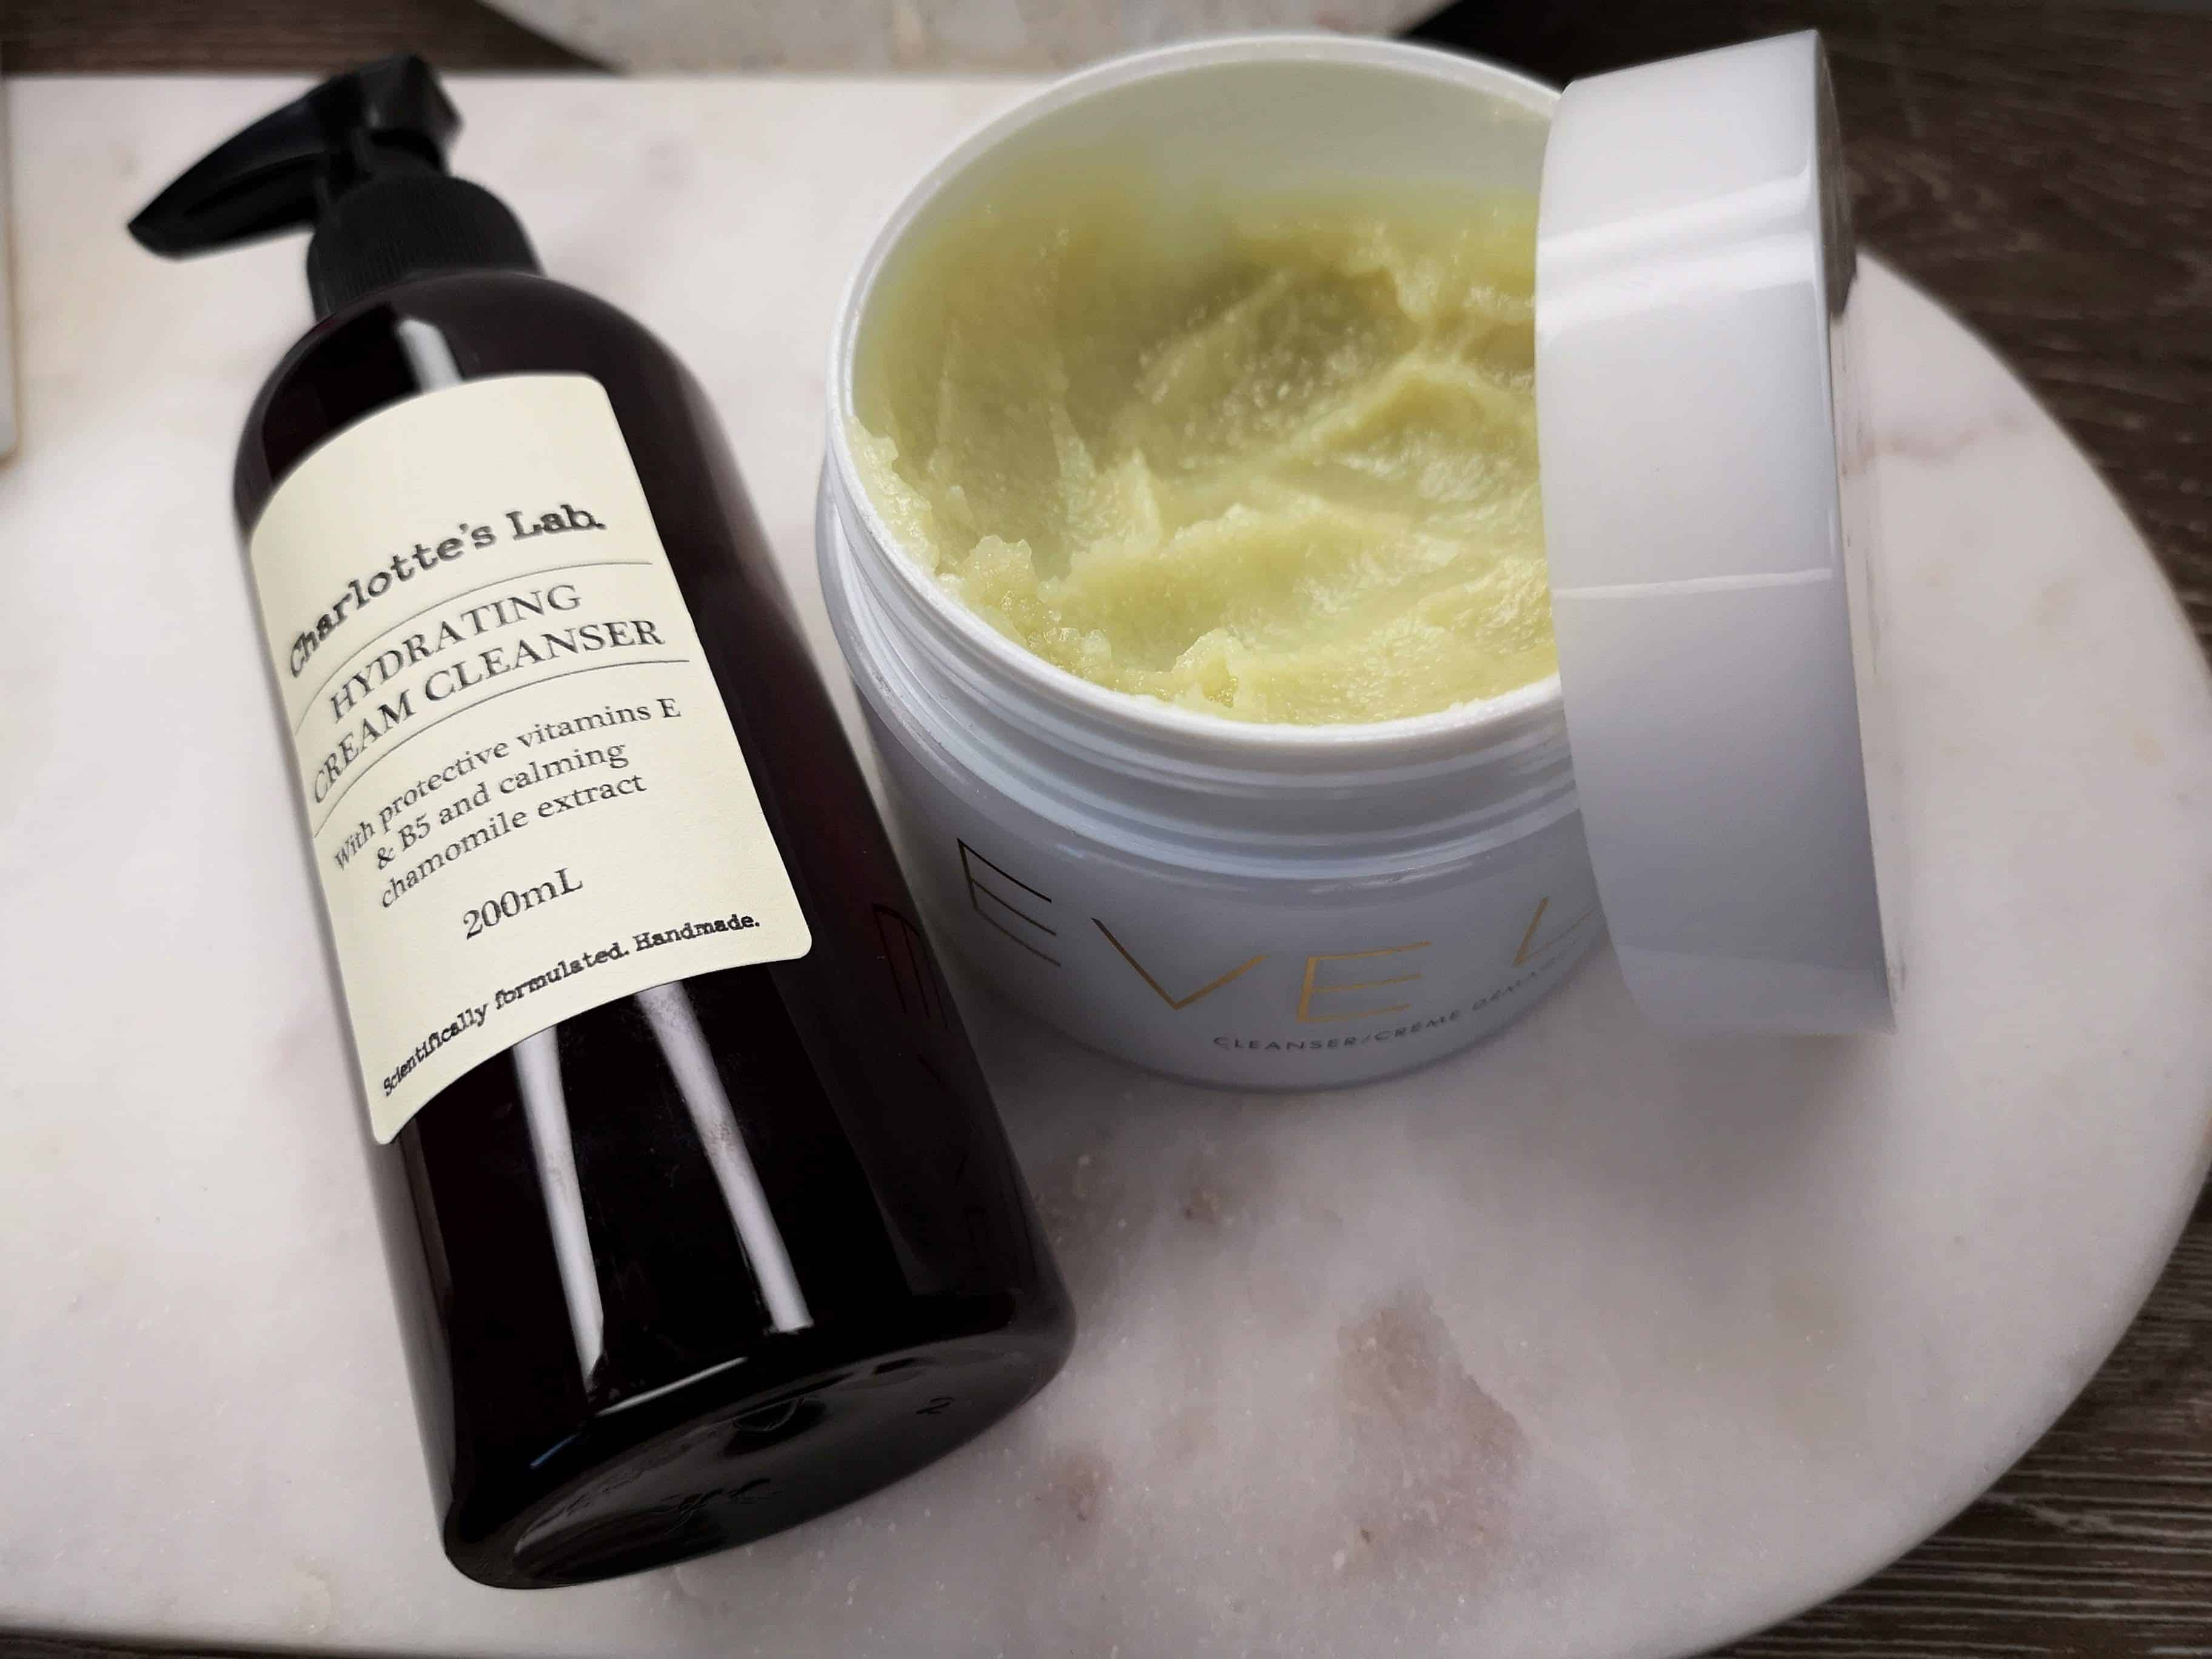 Charlottes Lab Skincare, Eve Lom Skincare, Bowral Makeup artist, Beauty Blog